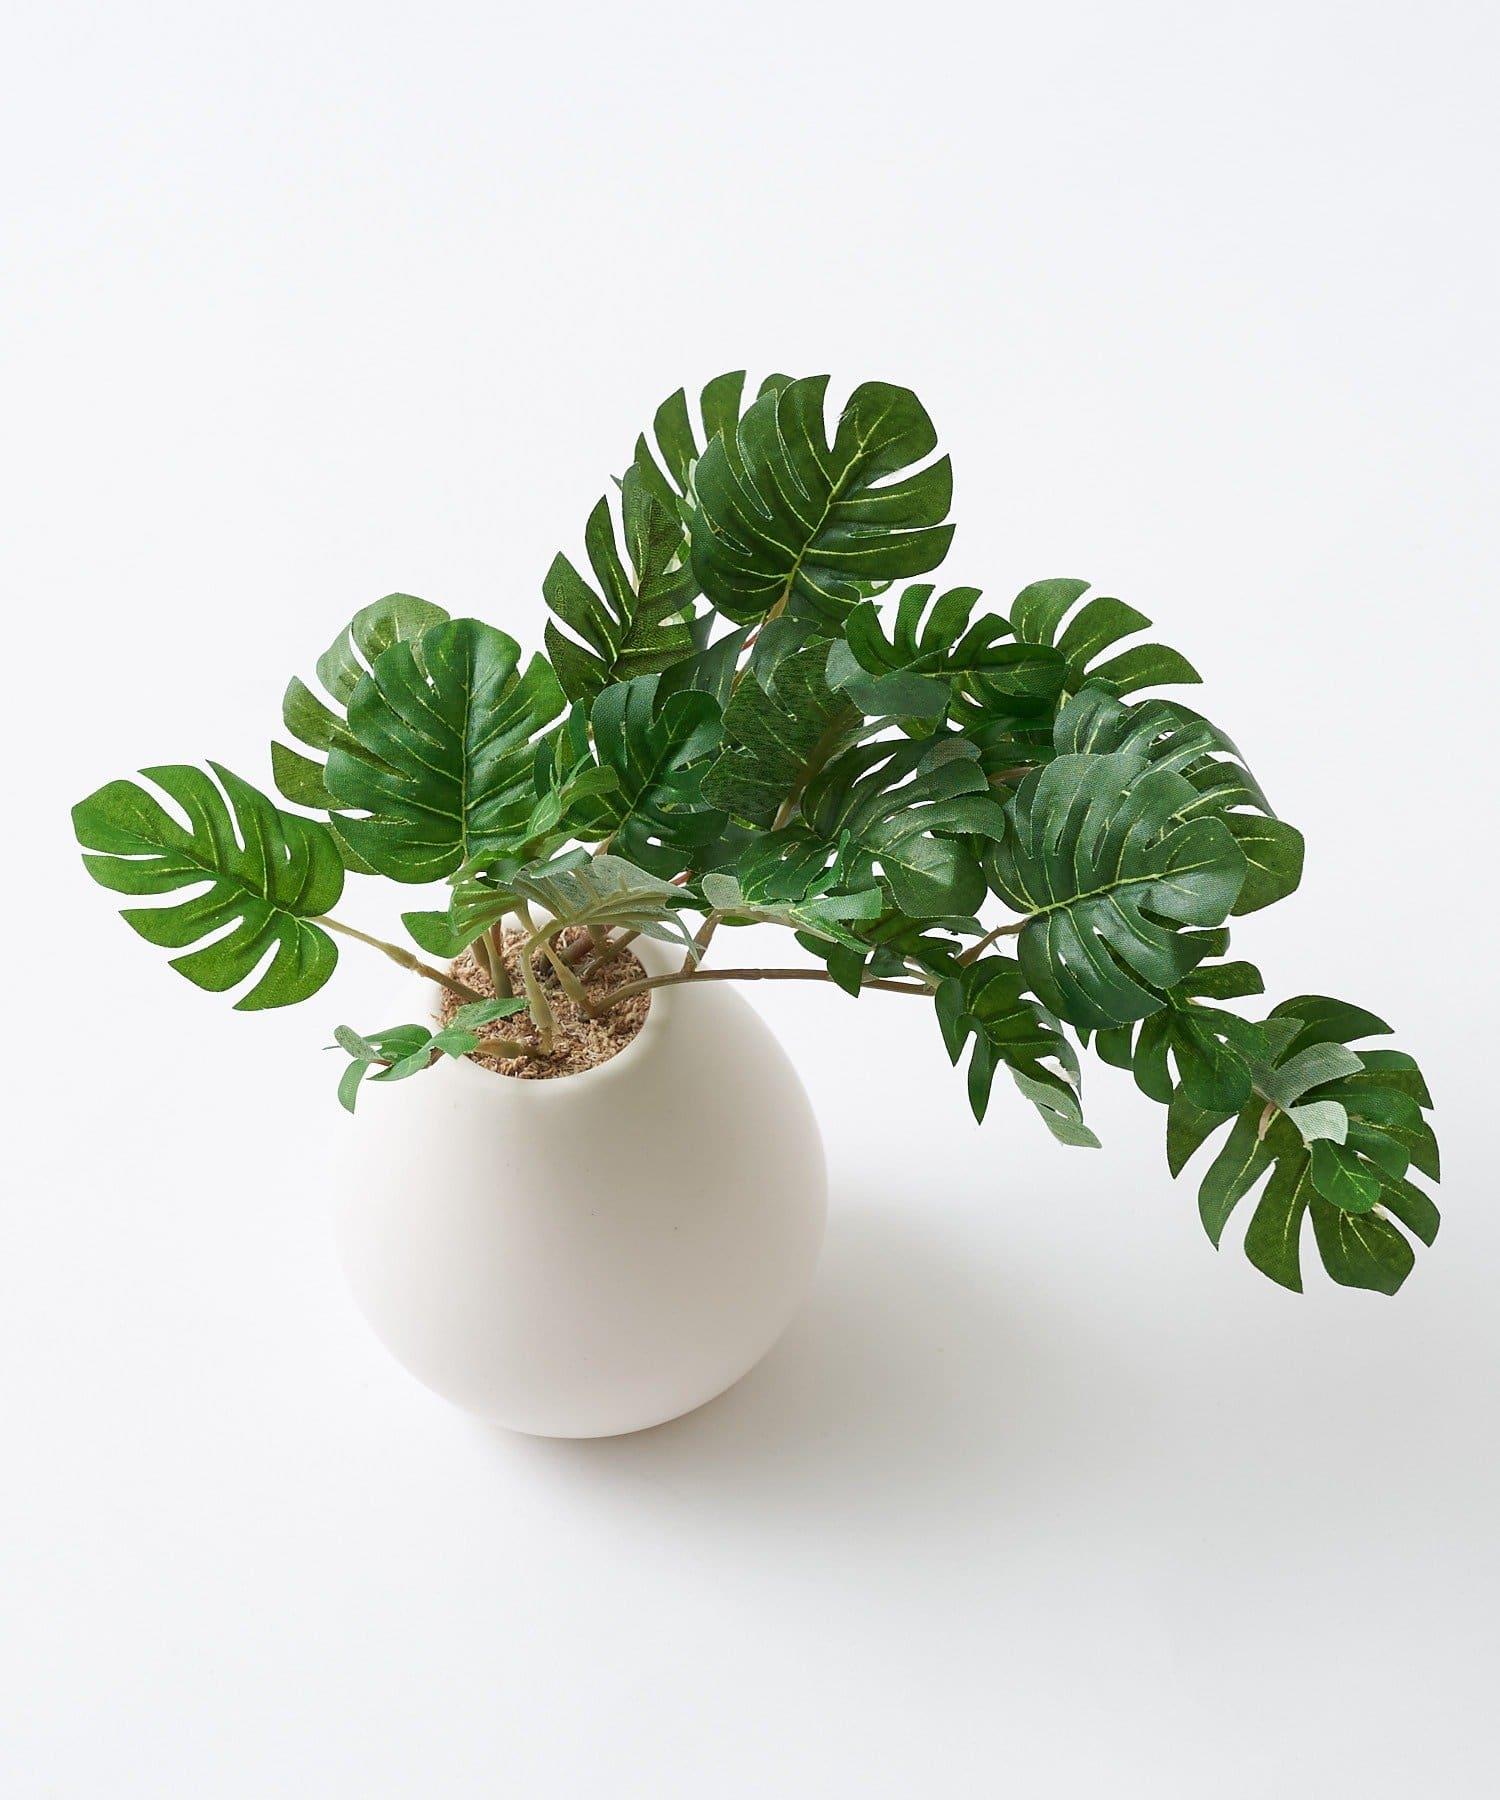 CIAOPANIC TYPY(チャオパニックティピー) ライフスタイル 〈ミニ観葉植物・フェイクグリーン〉MRポット グリーン